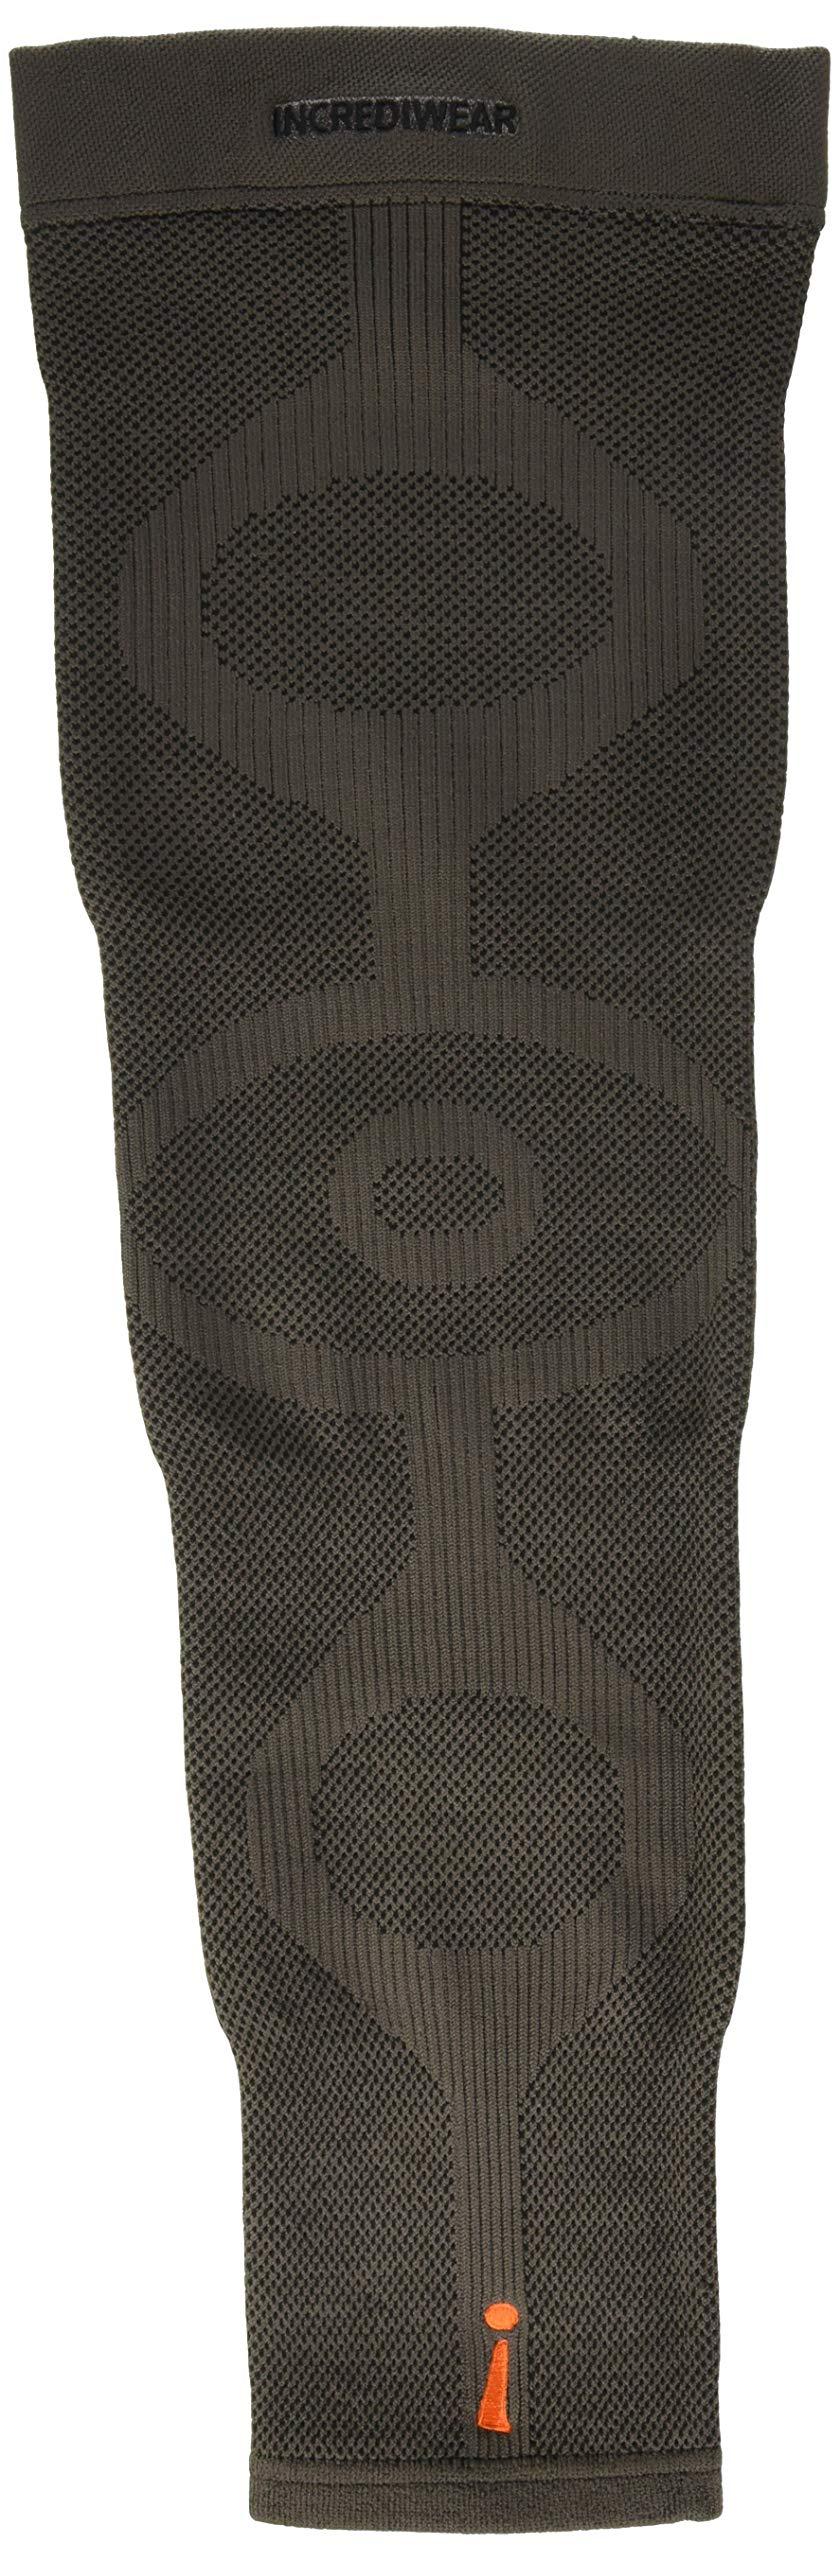 INCREDIWEAR Single Leg Sleeve, Charcoal, Medium, 0.03 Pound by Incrediwear